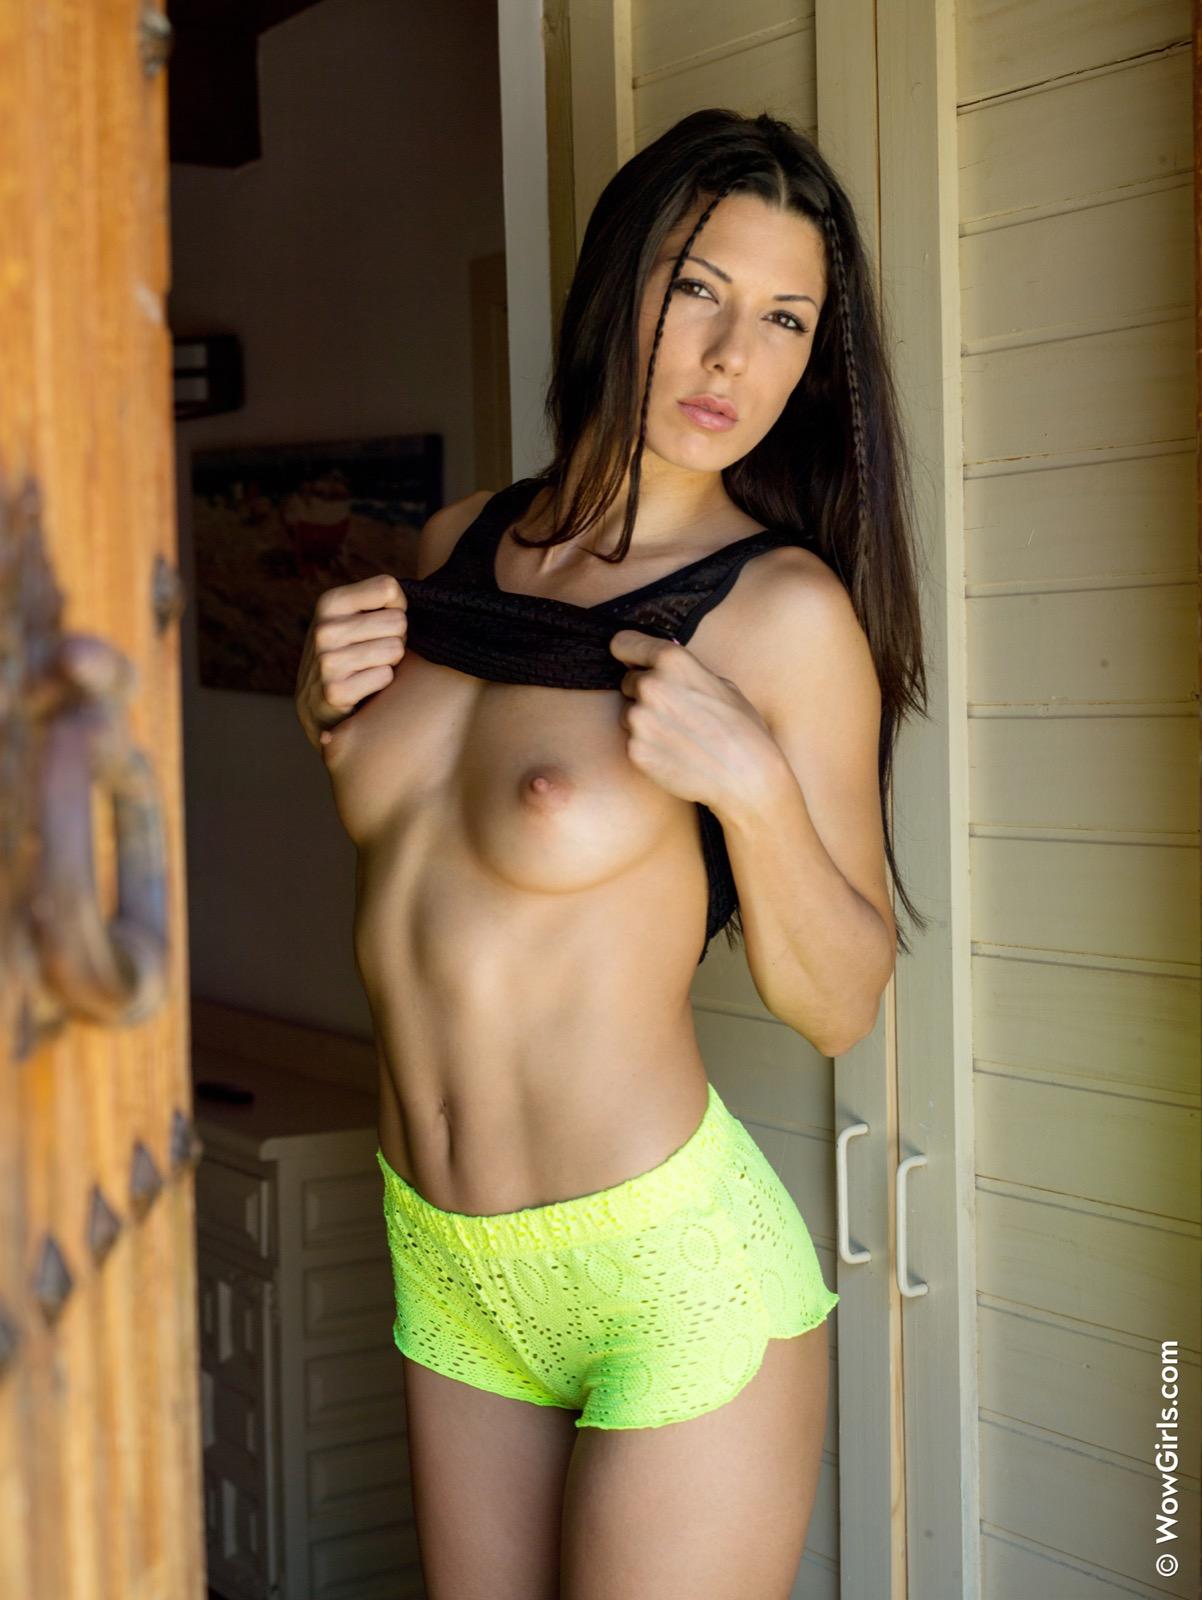 alexa_tomas_28849_3.jpg